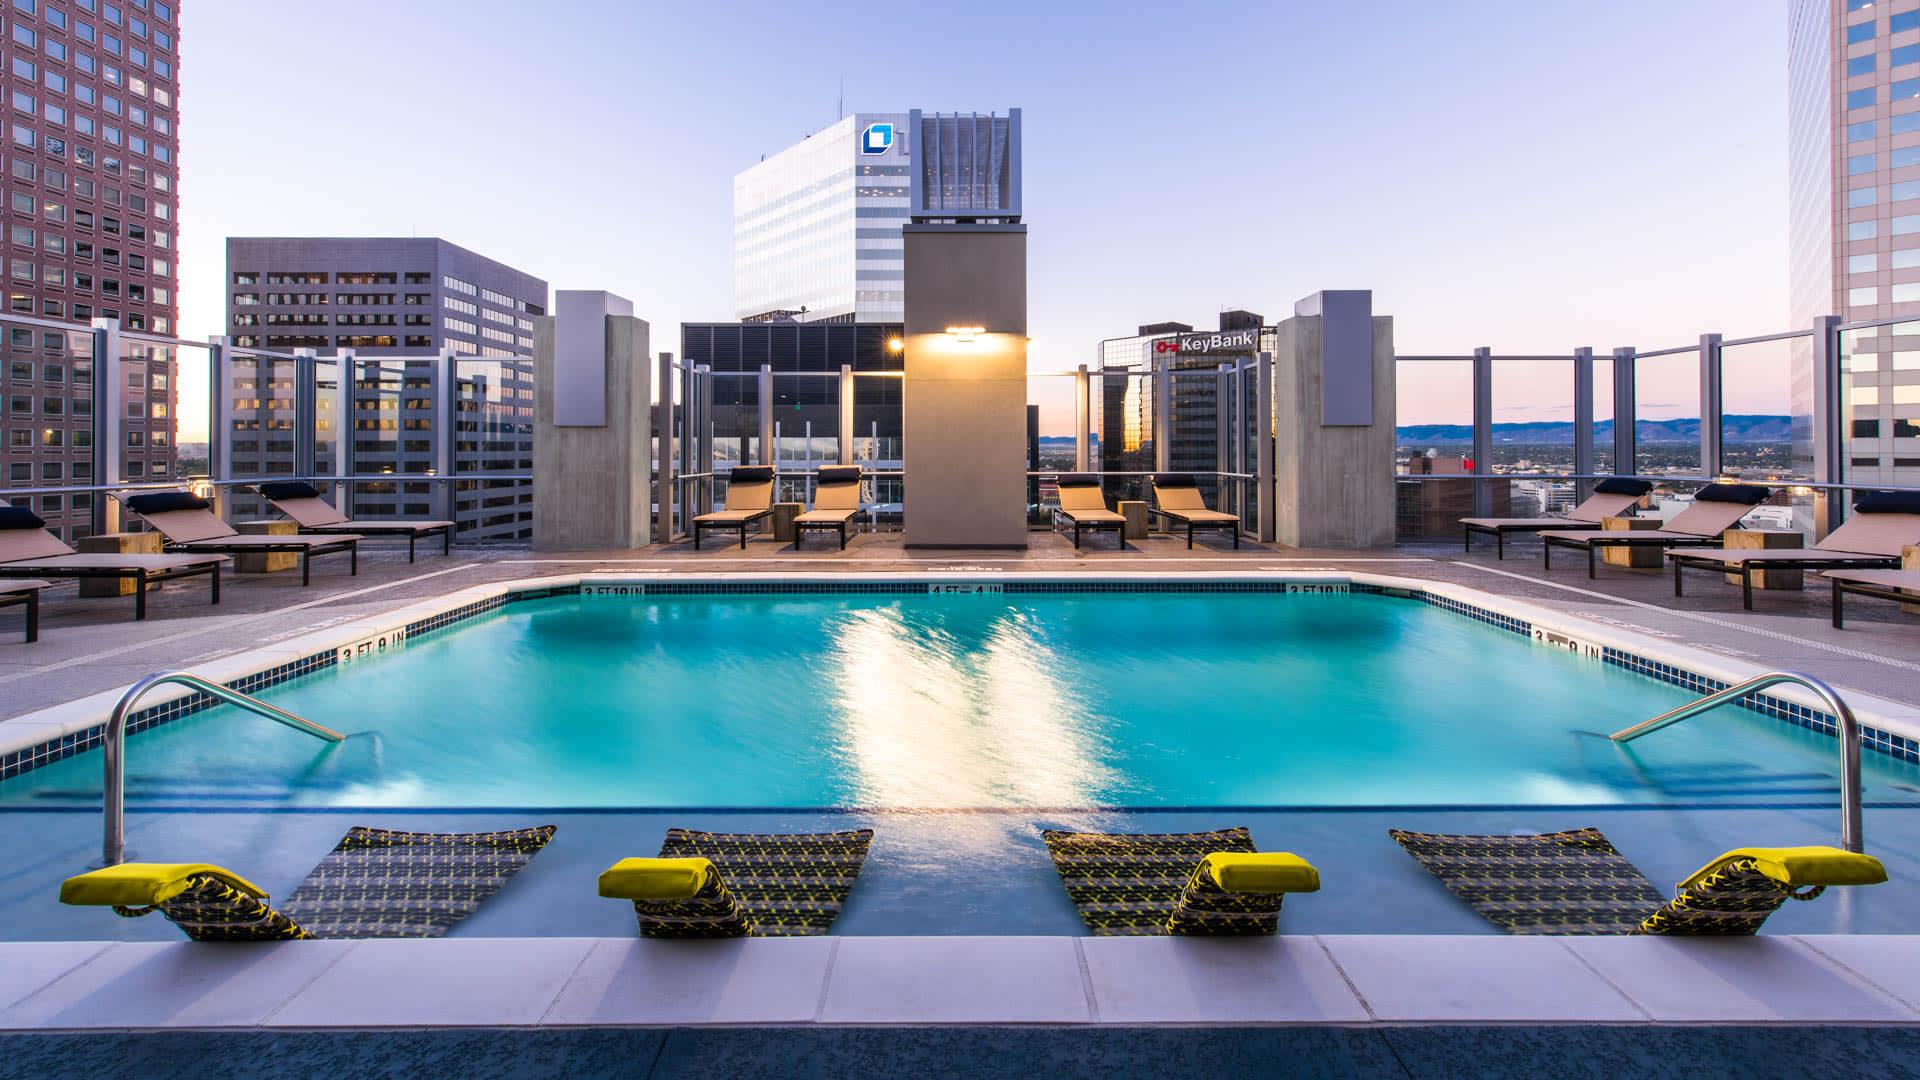 Skyhouse Denver Apartments - Swimming Pool